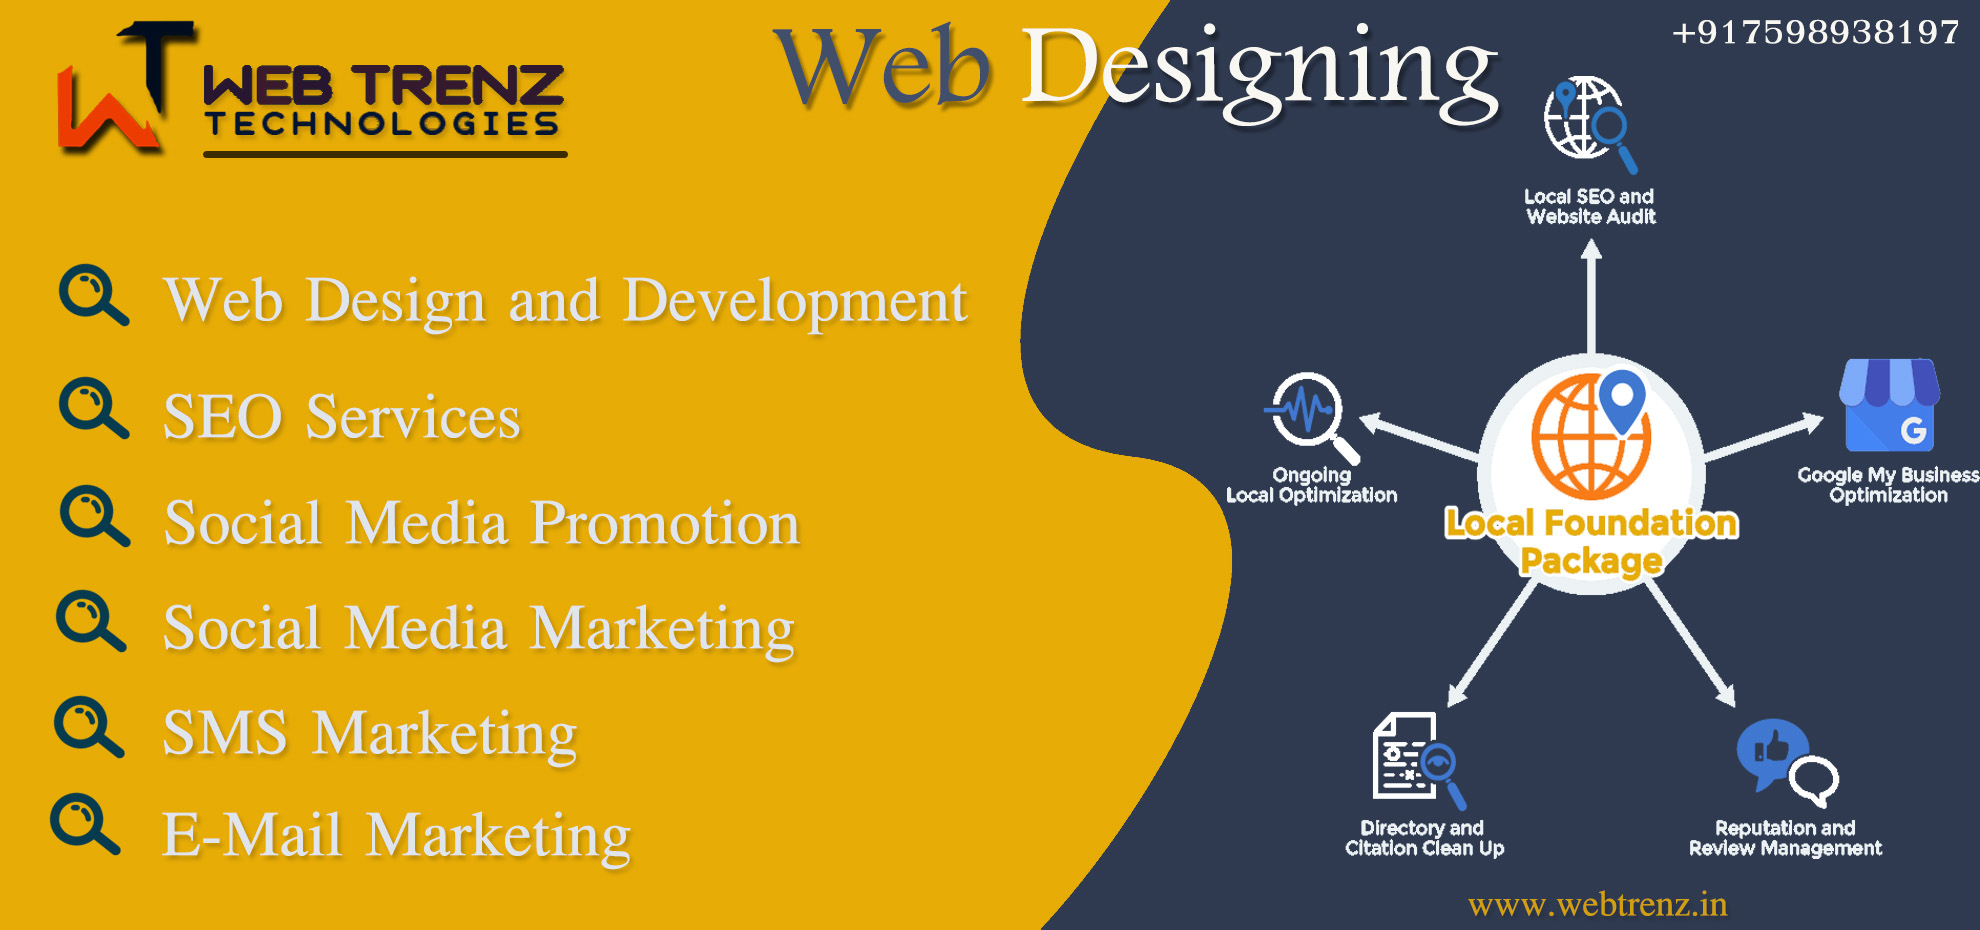 Web Trenz Technologies, Seo Company In Pattaravakkam, Seo Company In Pazhavanthangal, Seo Company In Peerkankaranai, Seo Company In Perambur, Seo Company In Peravallur, Seo Company In Perumbakkam